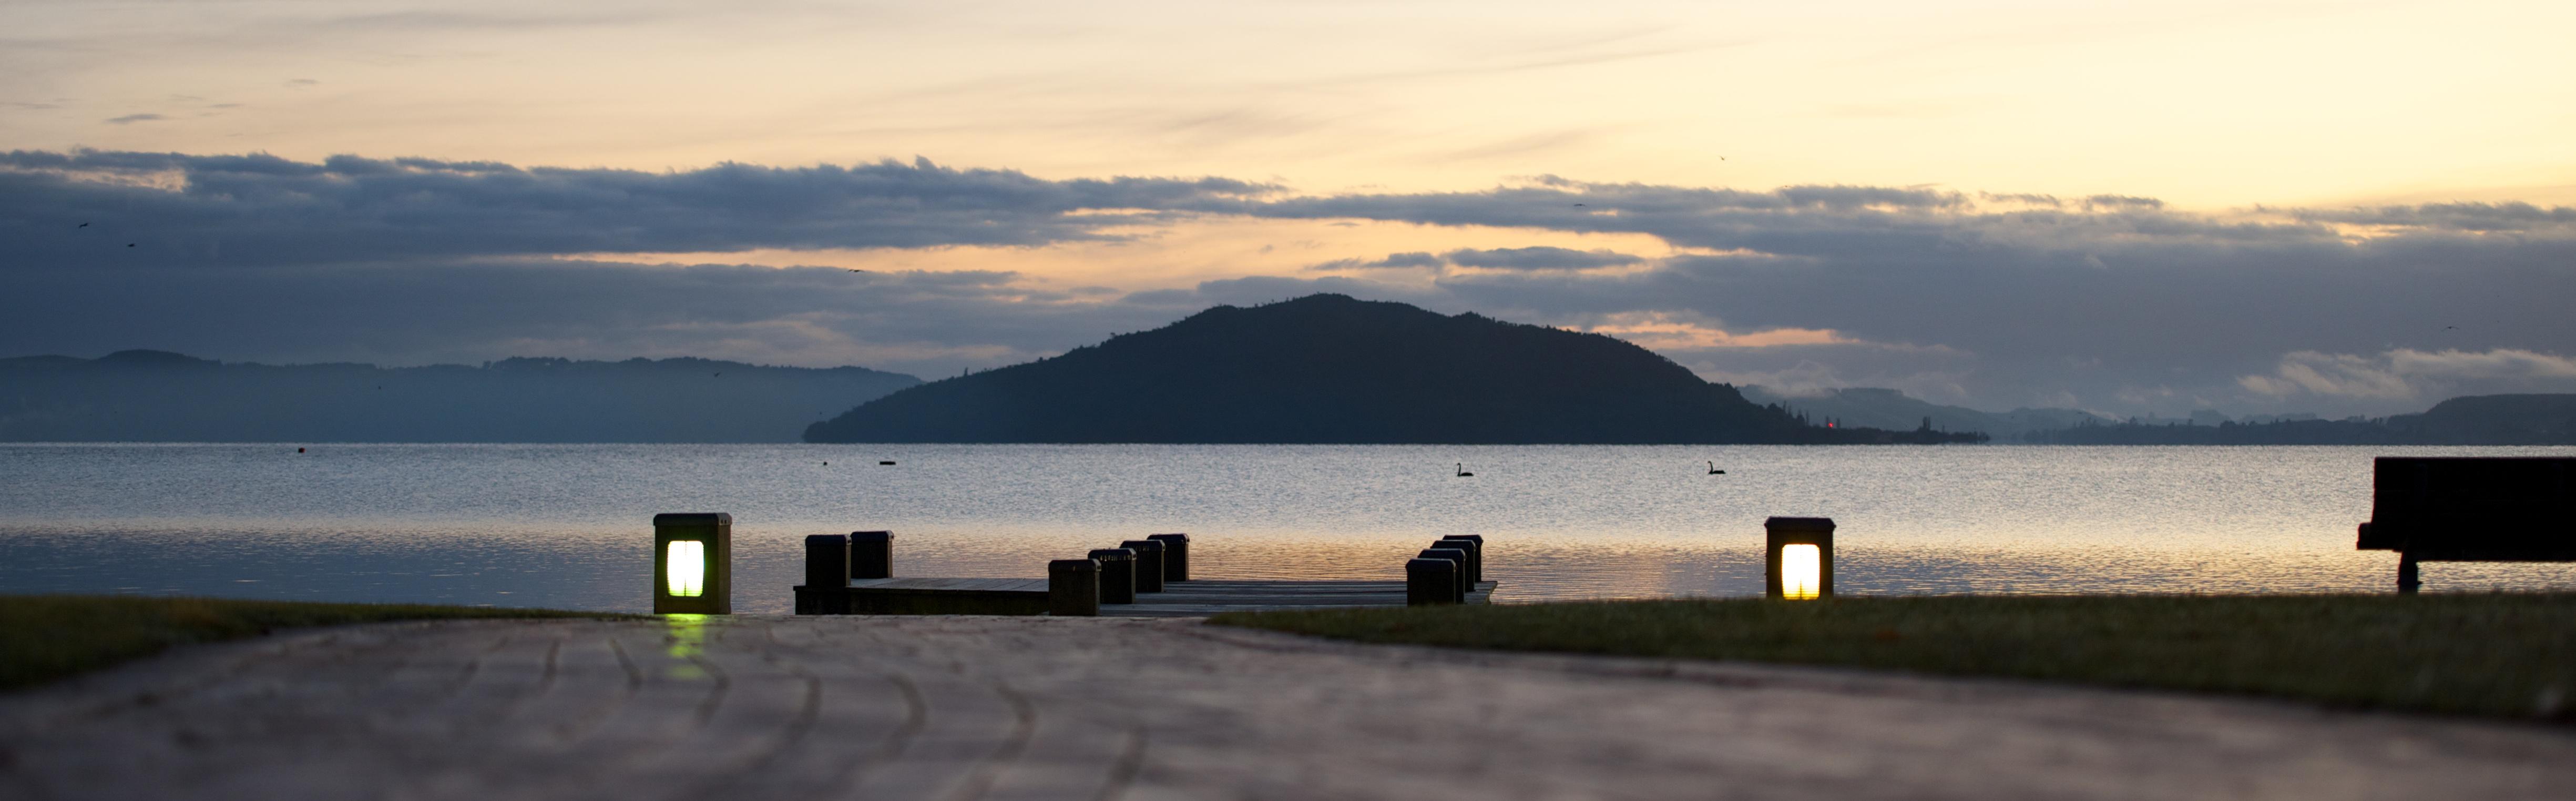 Morning Rotorua Lake Front